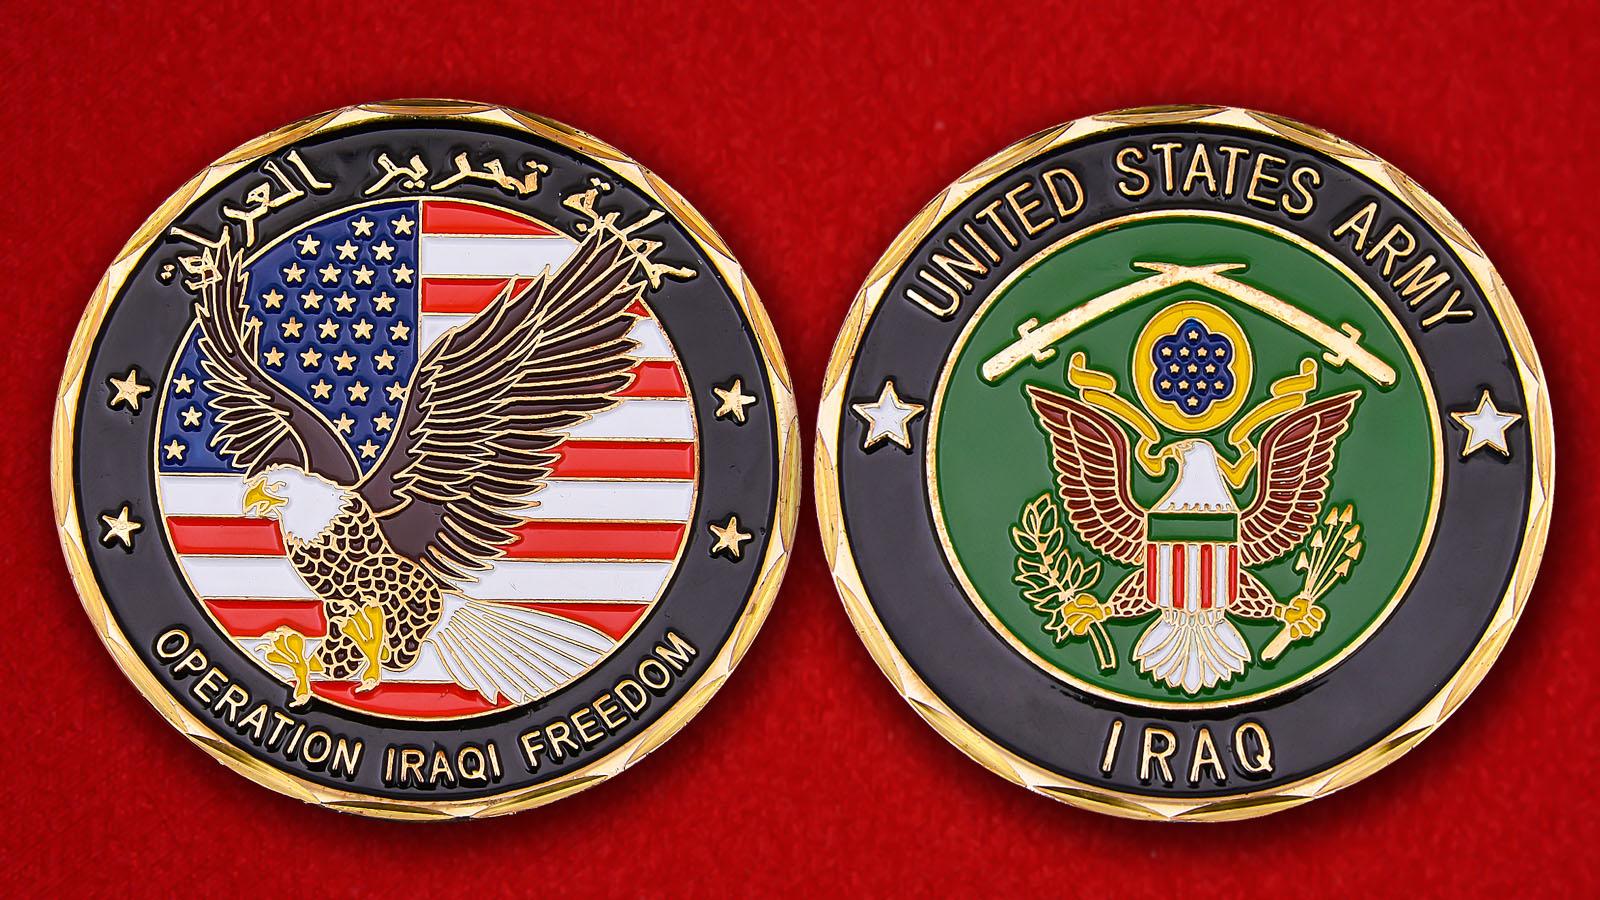 Unites States Army Operation Iraqi Freedom Challenge Coin